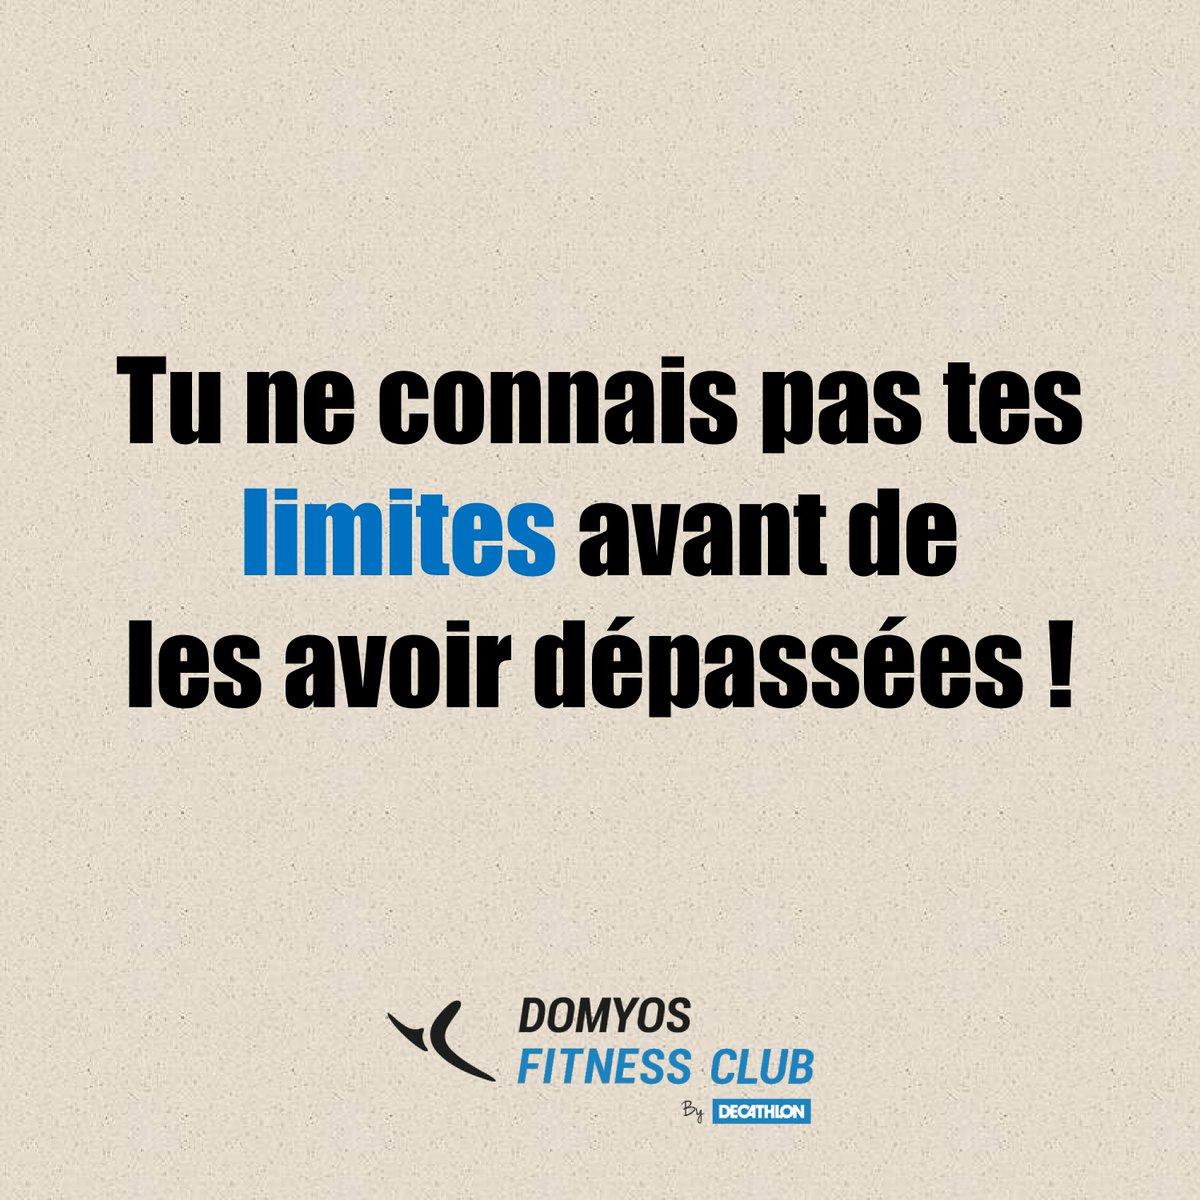 Domyos Fitness Club On Twitter Domyos Fitness Club